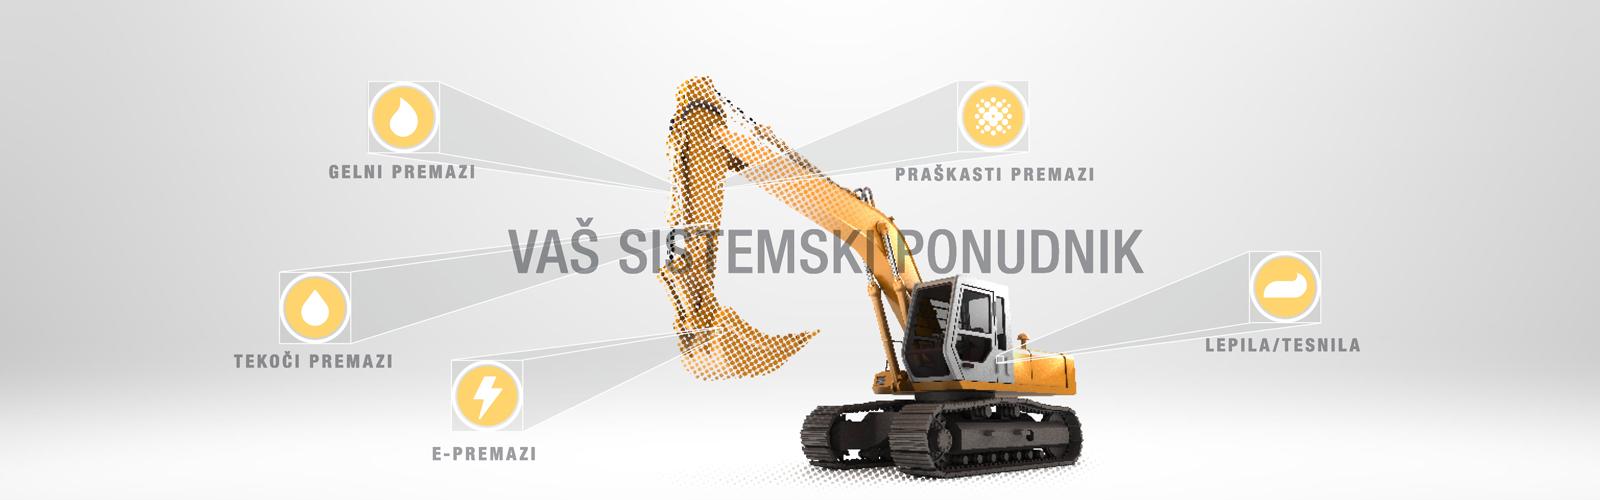 system supplier